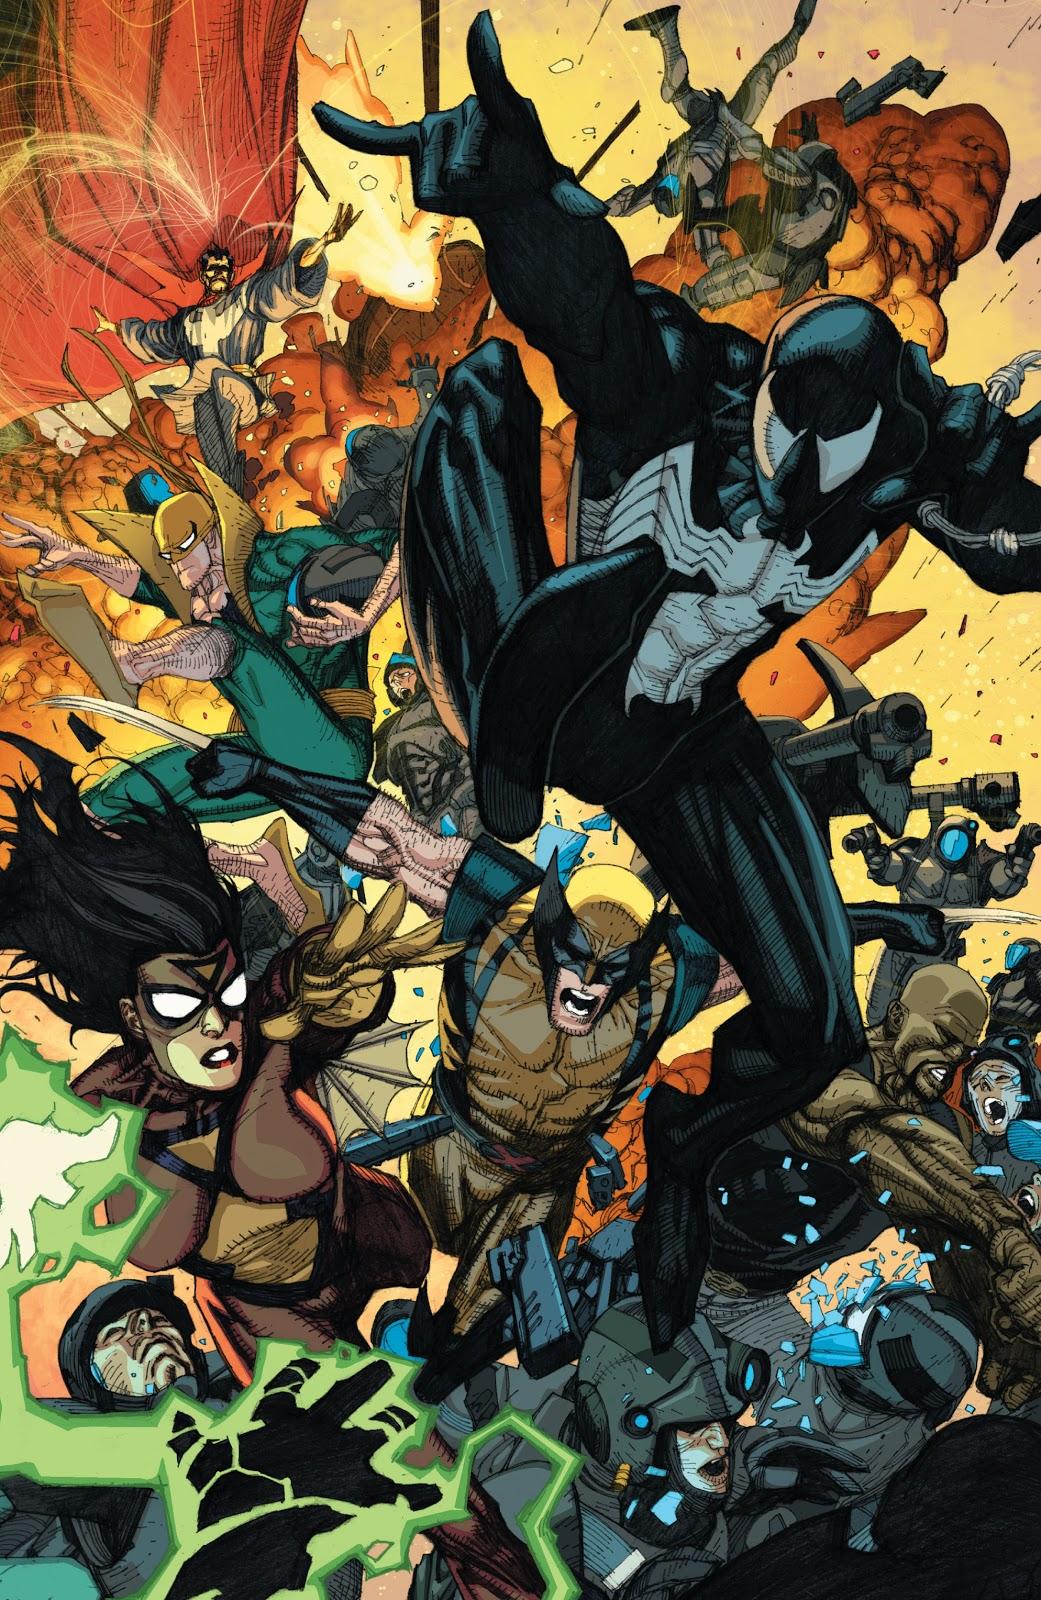 The New Avengers Vol. 1 #27